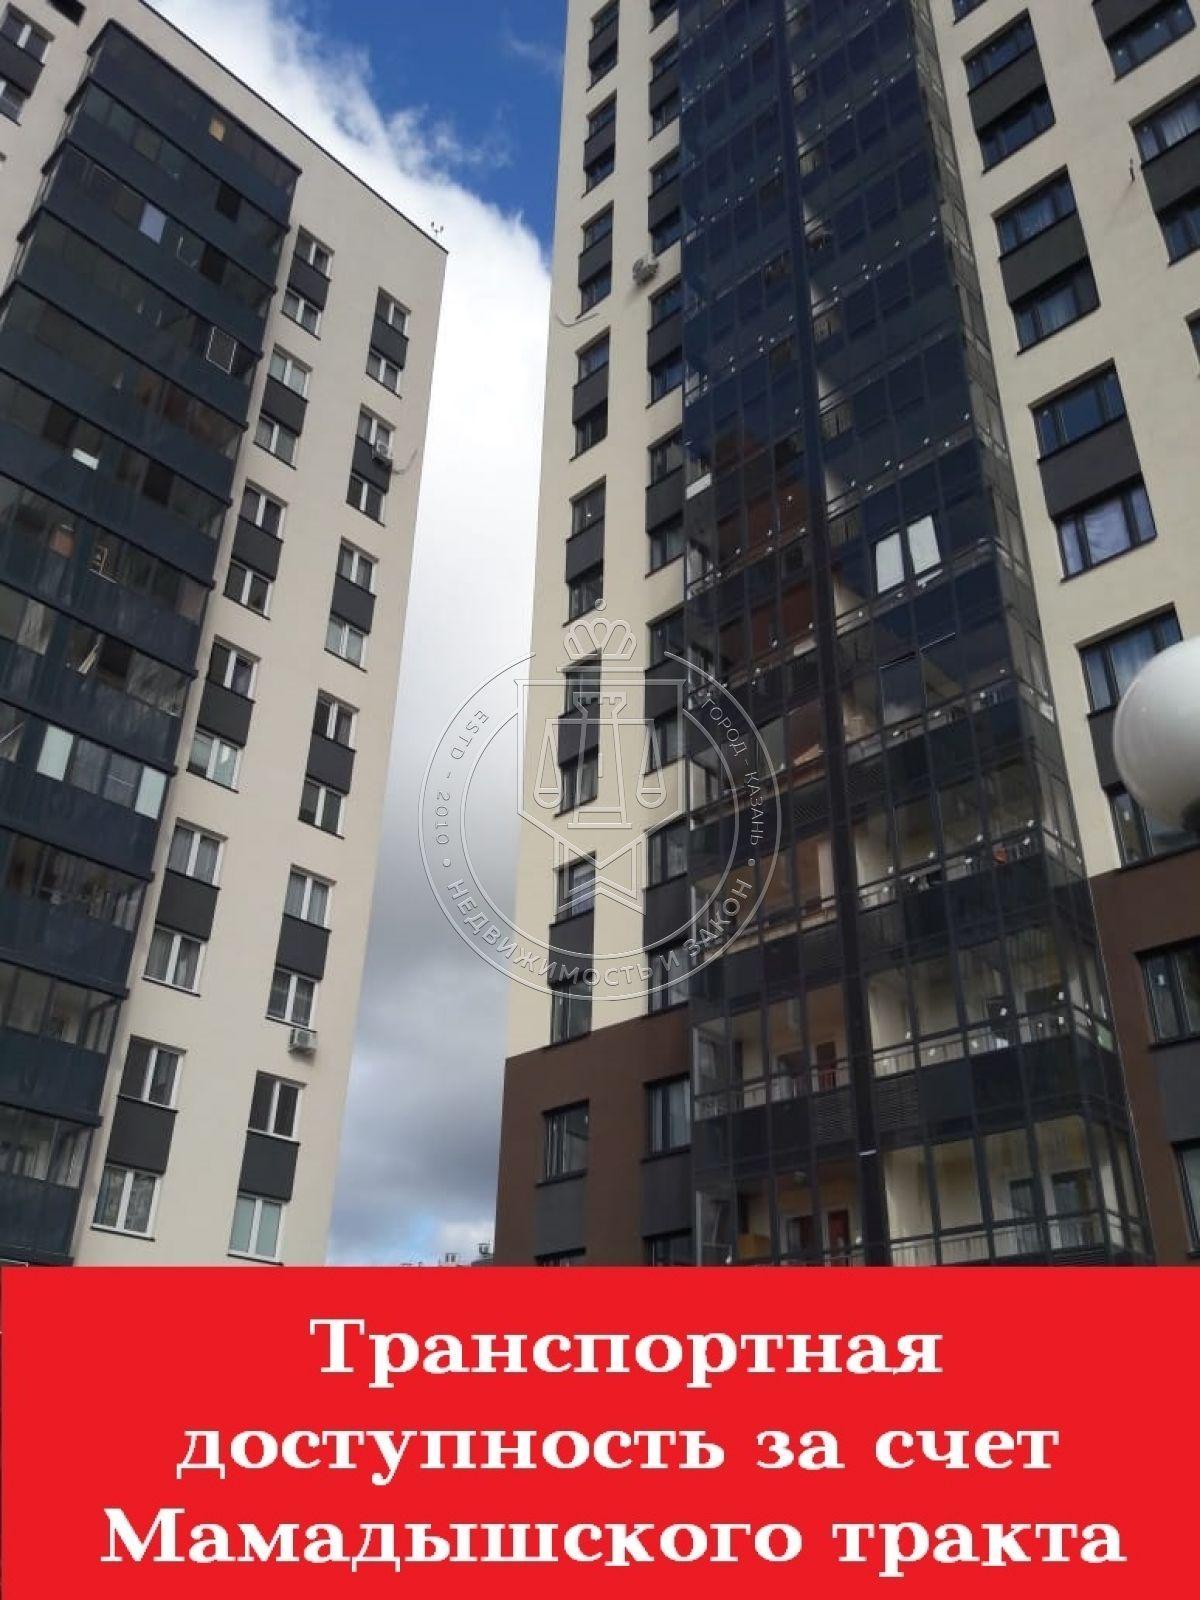 Продажа 3-к квартиры Александра Курынова ул, 1-15-1